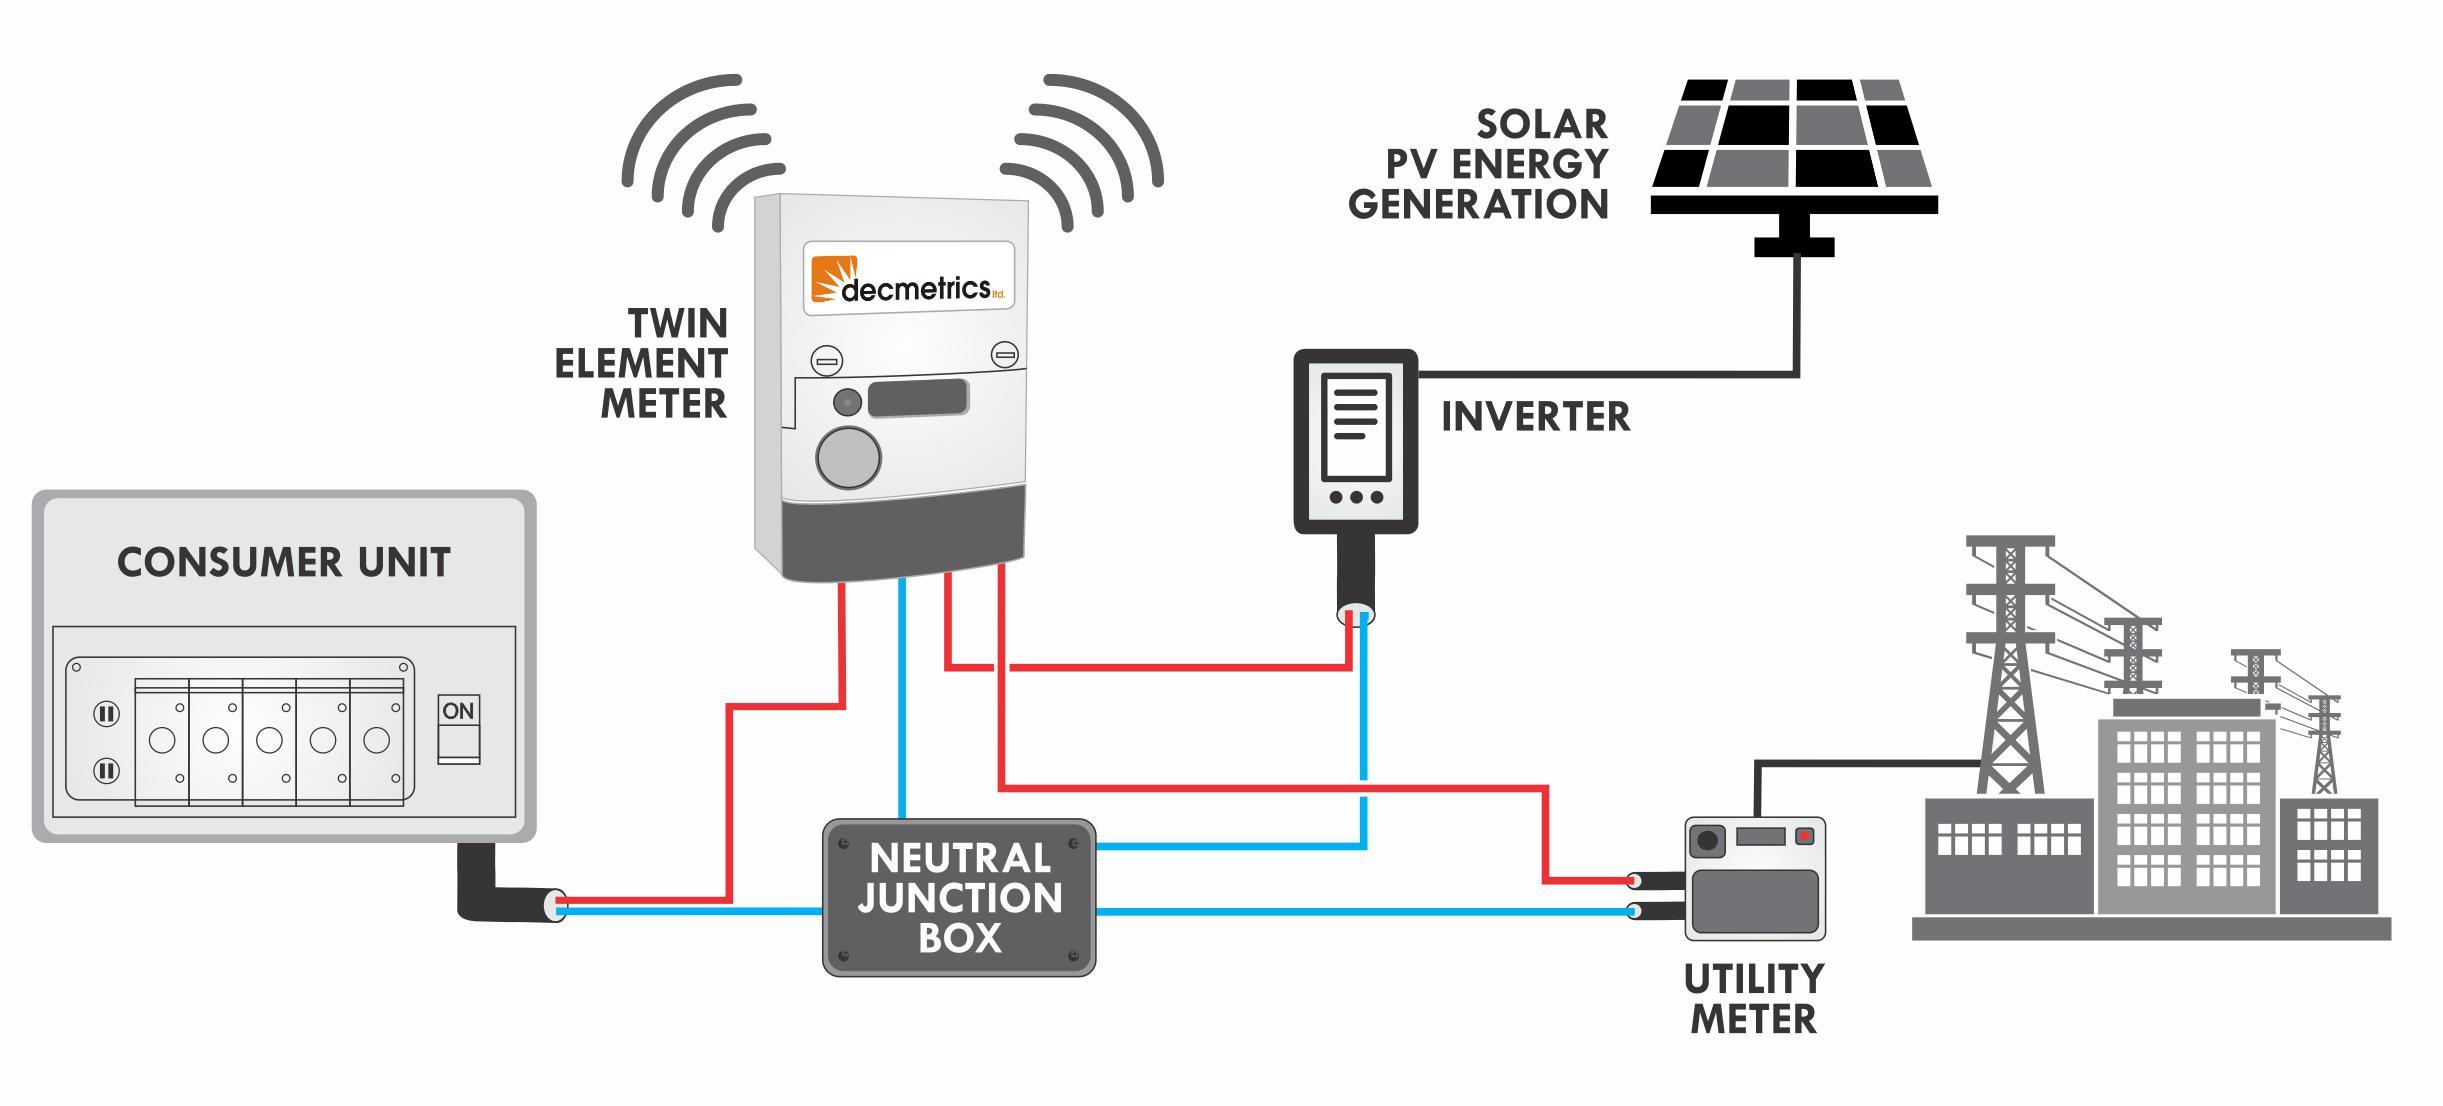 net metering wiring diagram wiring diagrams favoritessolar pv solar pv net metering schematic diagram solar net [ 2443 x 1106 Pixel ]